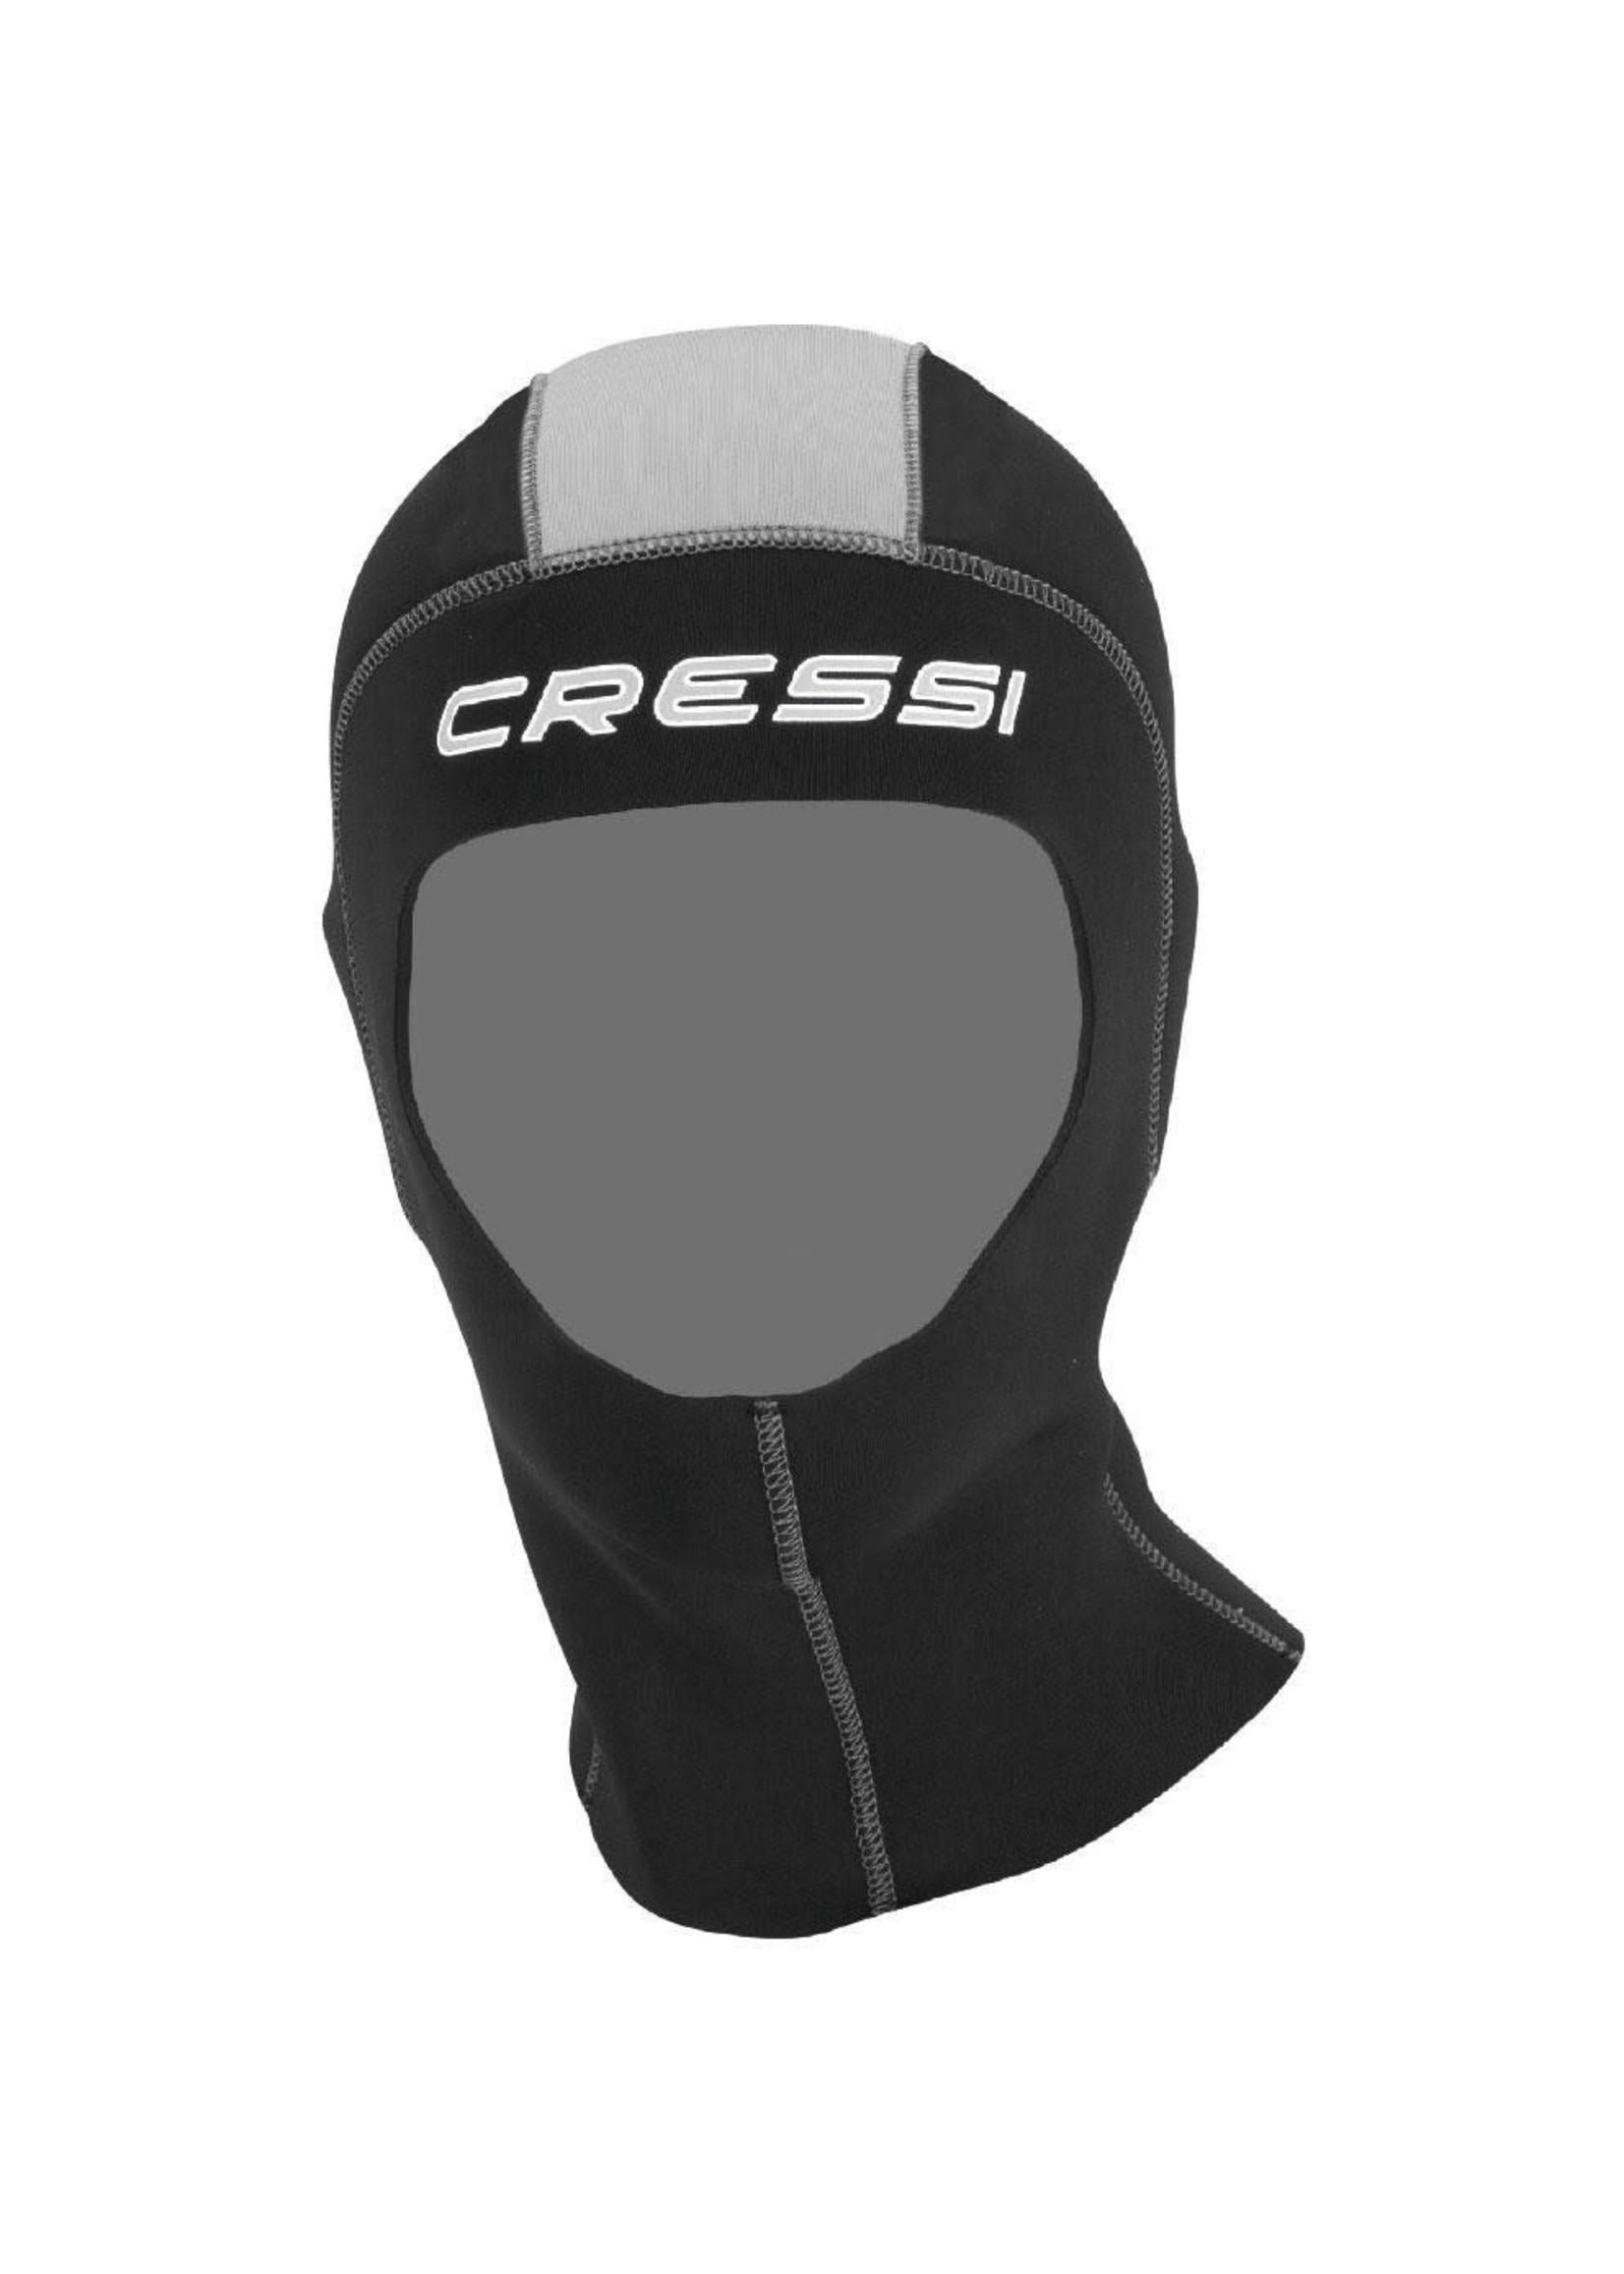 Cressi Cressi Standard Hood 5mm - man